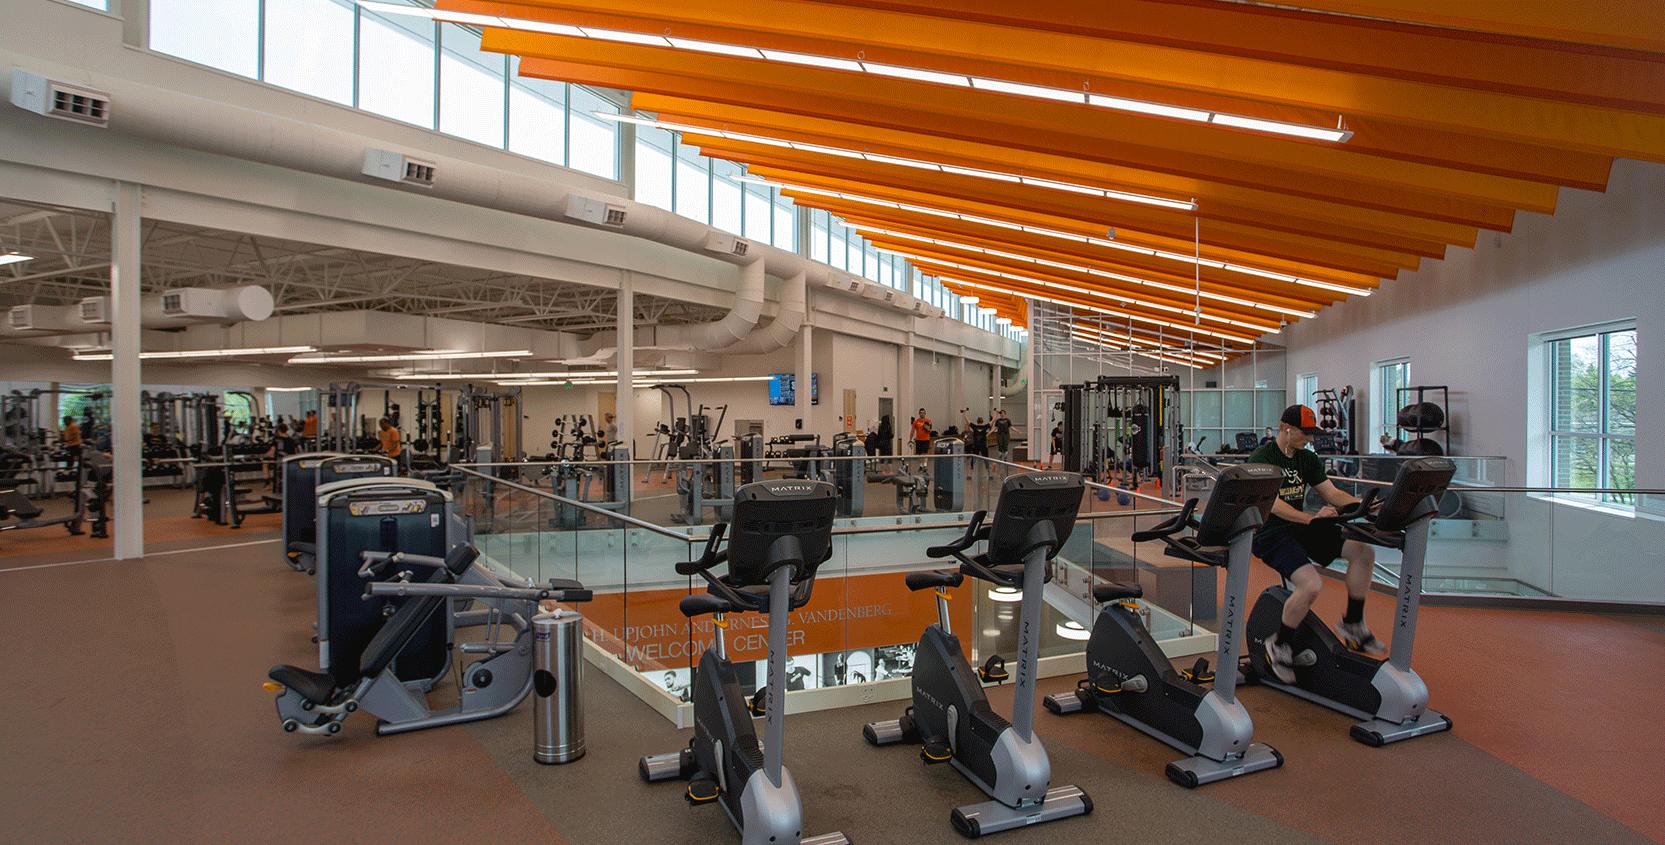 Kalamazoo-College-Fitness-&-Wellness-Ctr-Weight-Room-2-1665x845